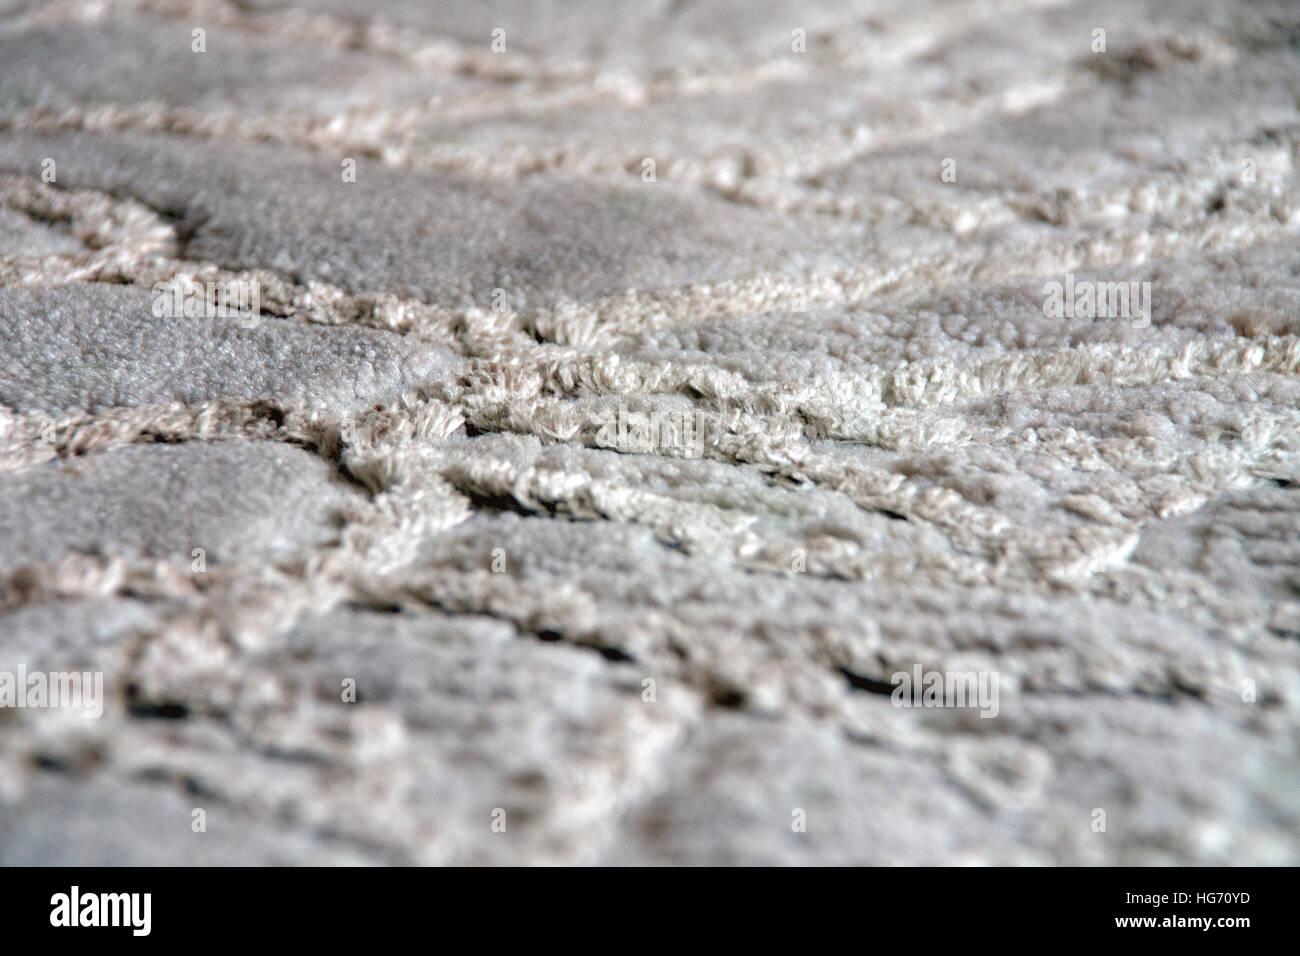 Teppich - Dekor, Hintergründe, Stockbild